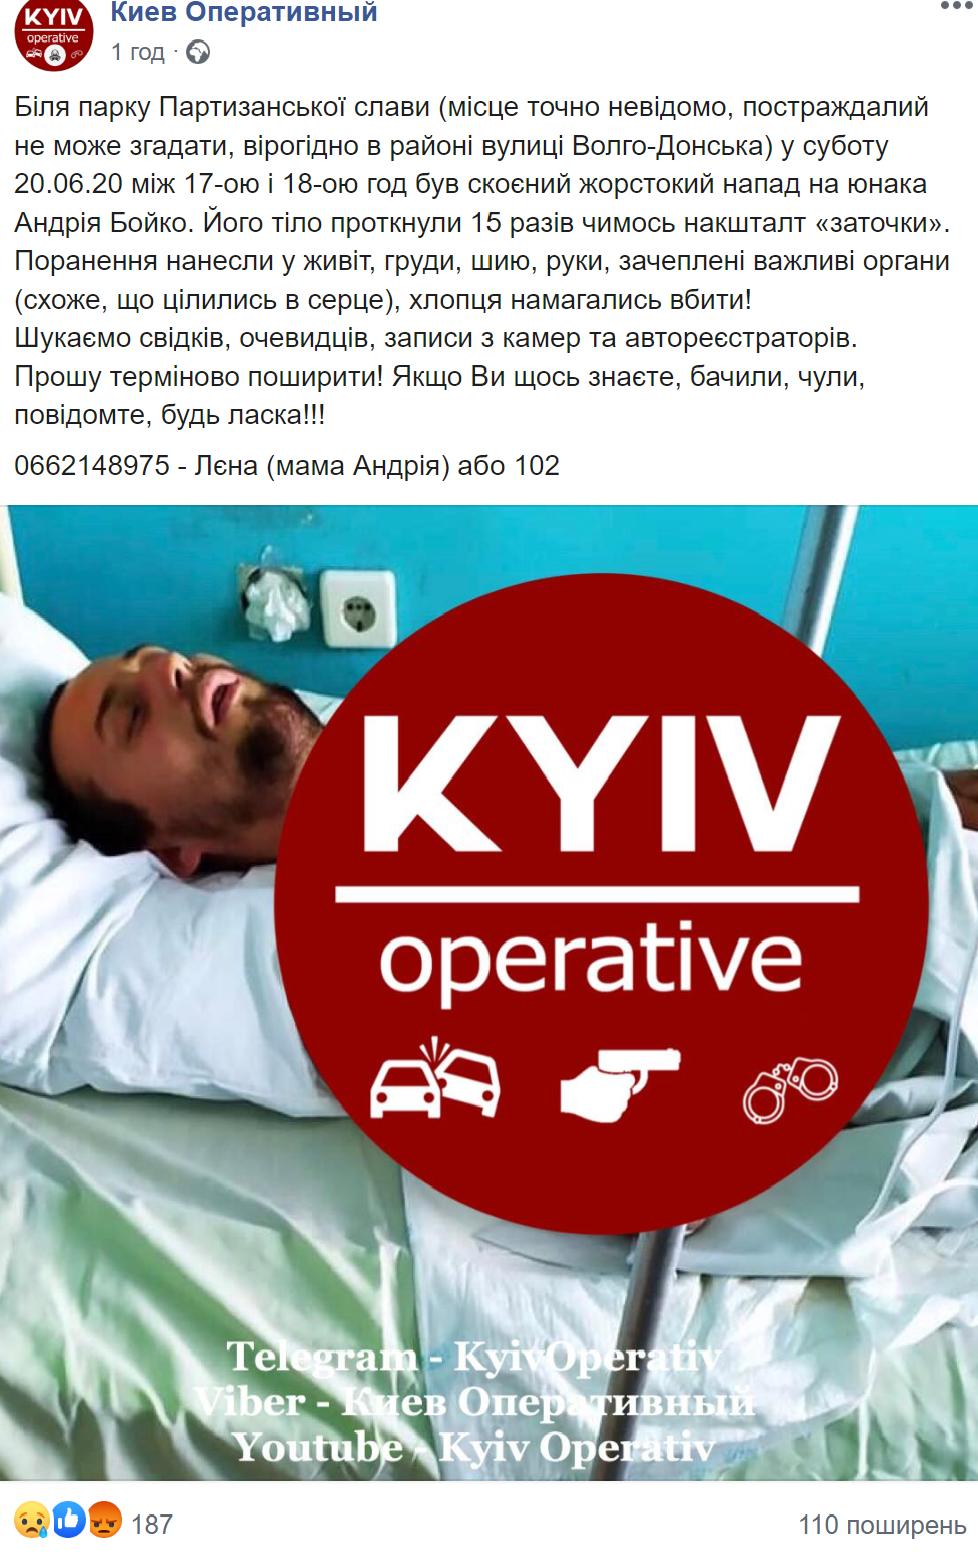 Пост о нападении на парня в Киеве